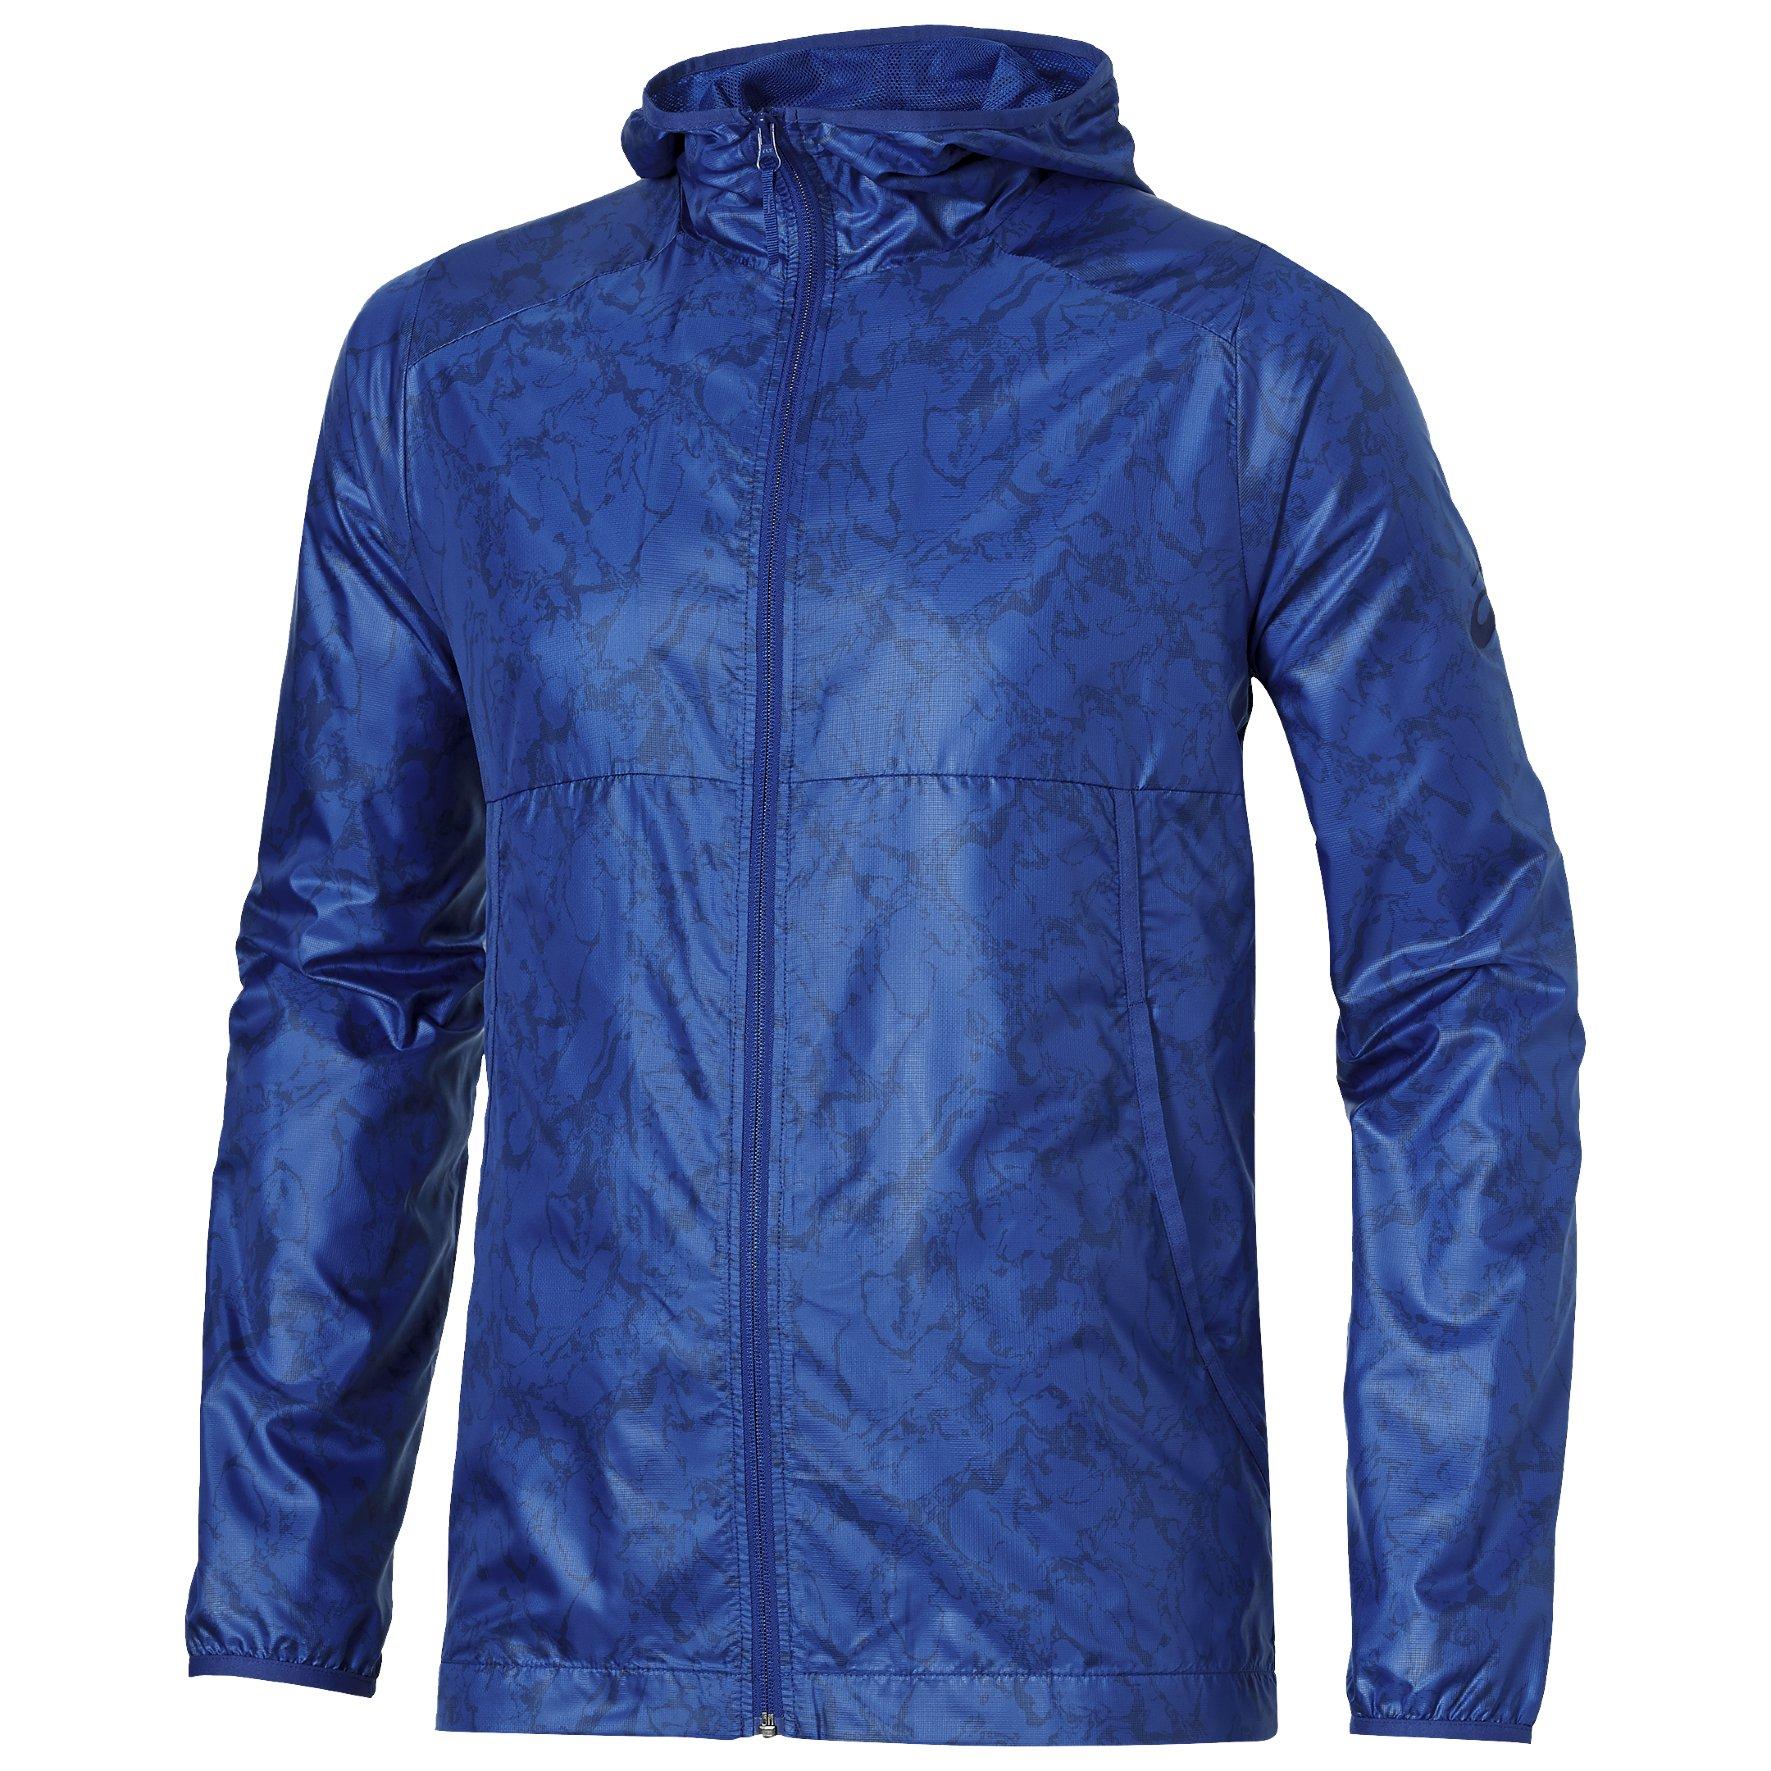 Купить Спортивную Куртку